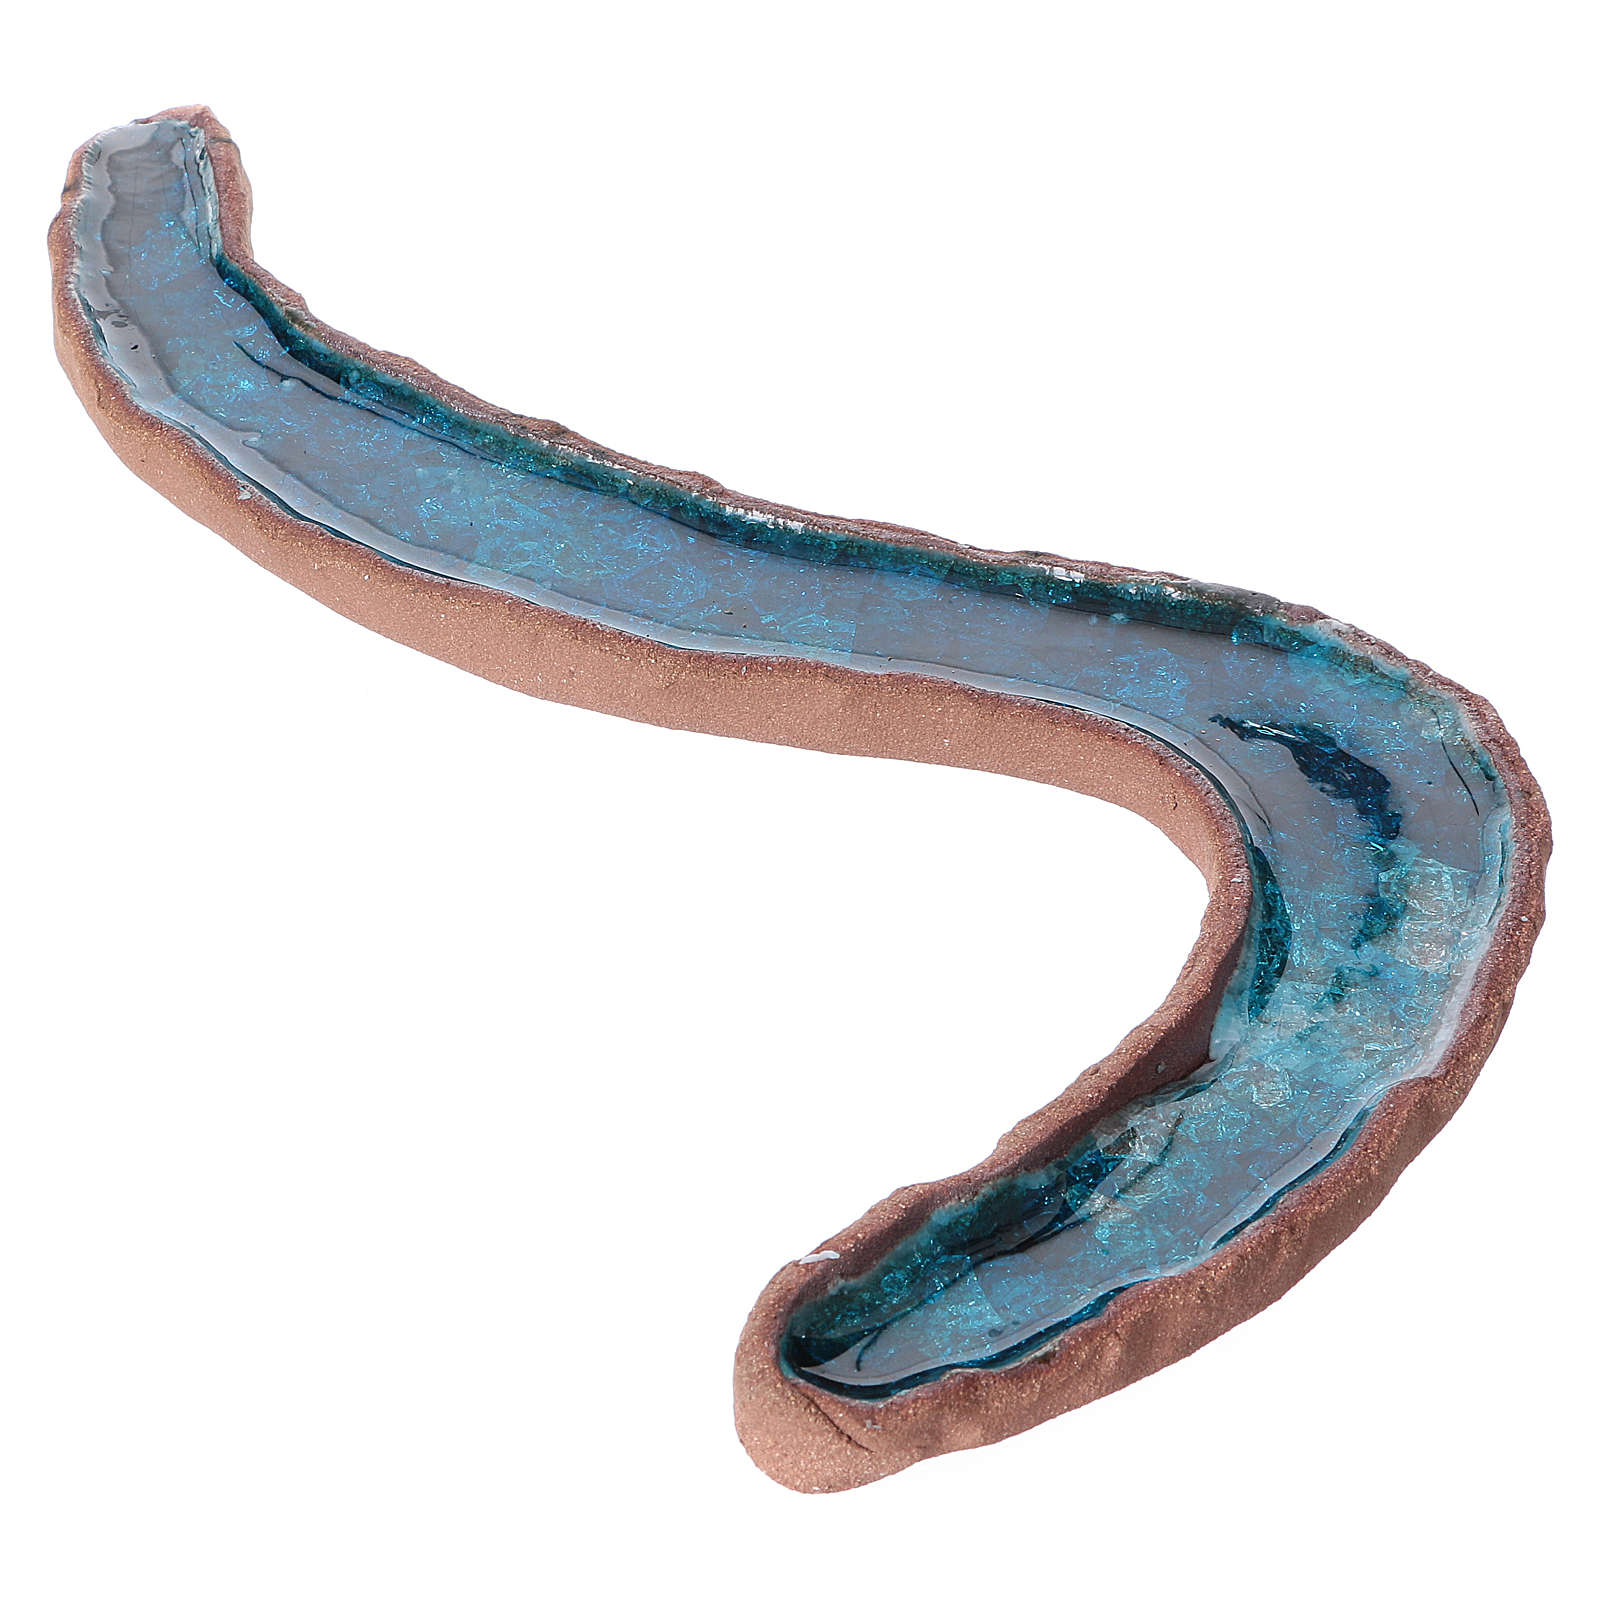 Río doble meandro cerámica esmaltada 5x30x15 cm 4